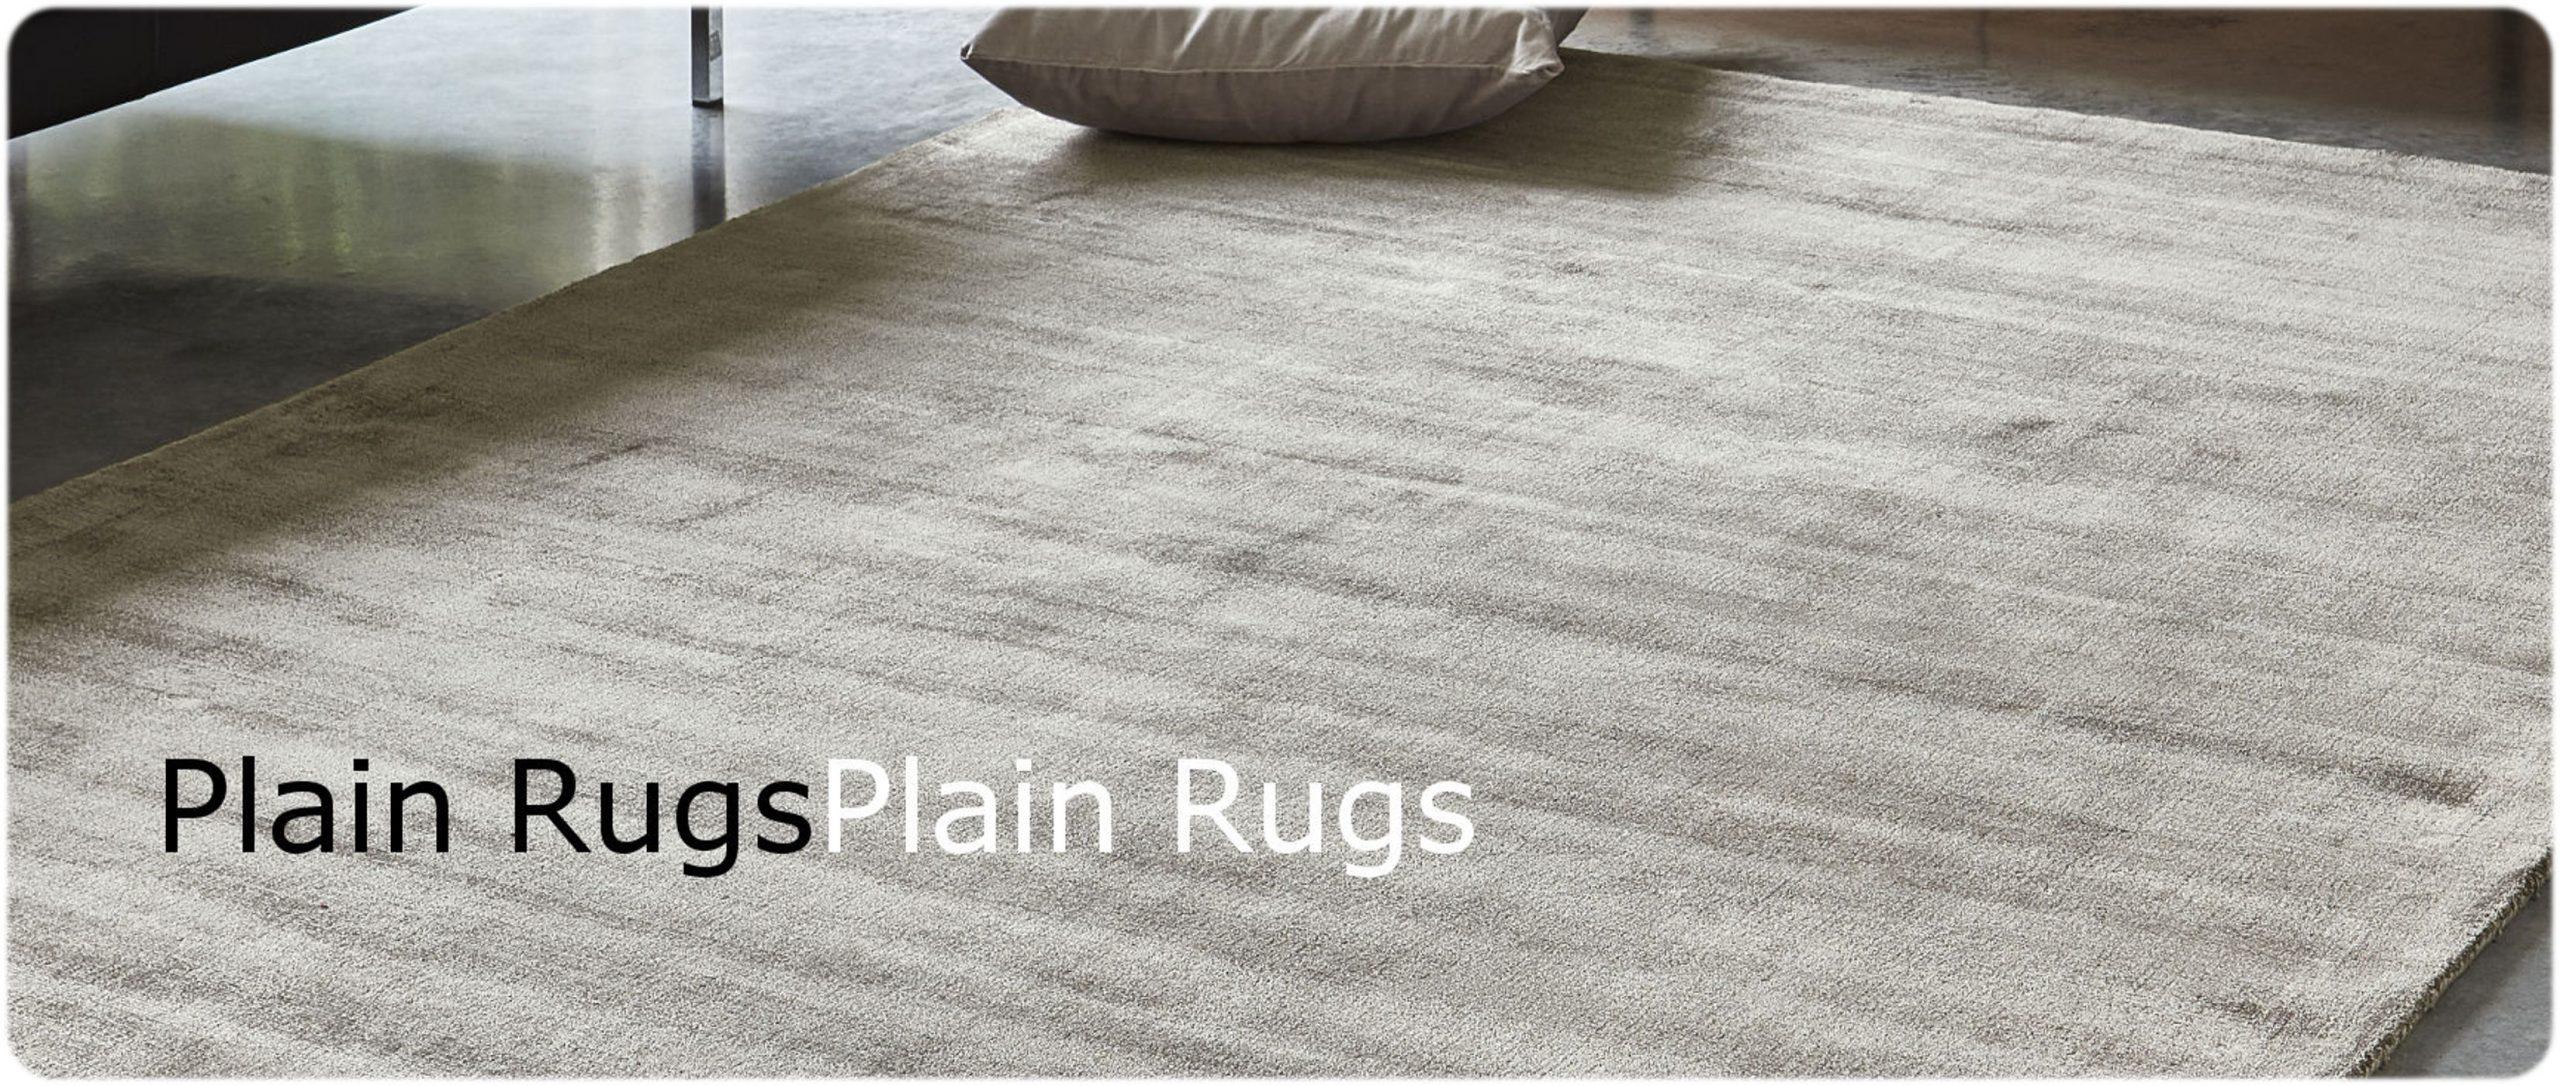 plain rugs logo